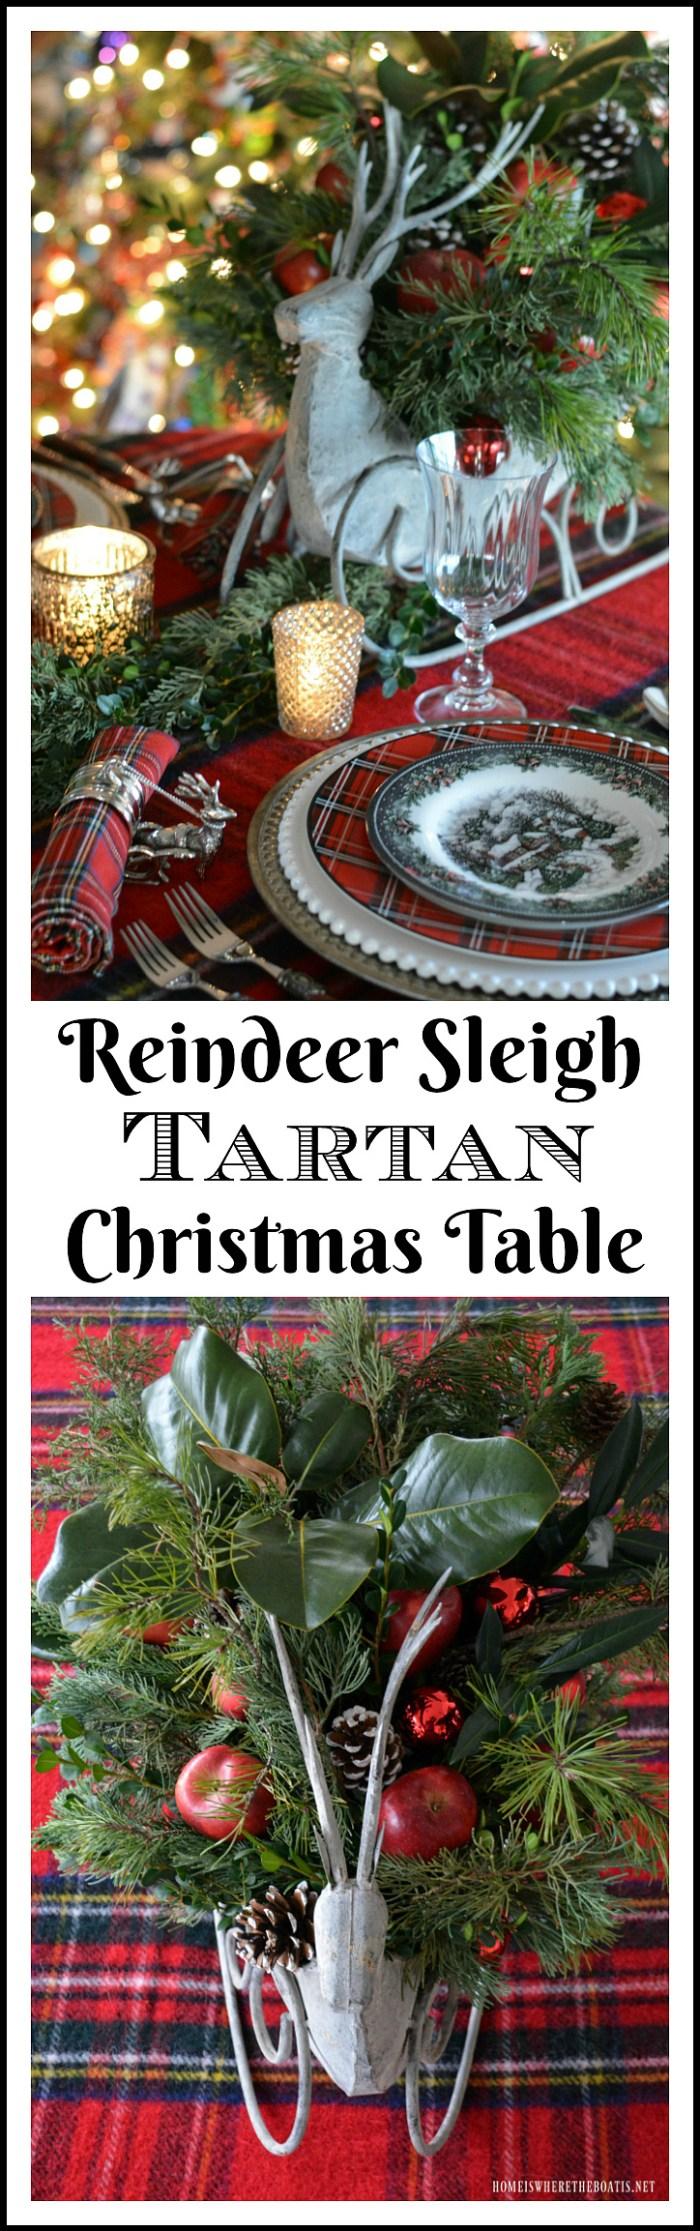 reindeer-sleigh-tartan-christmas-table